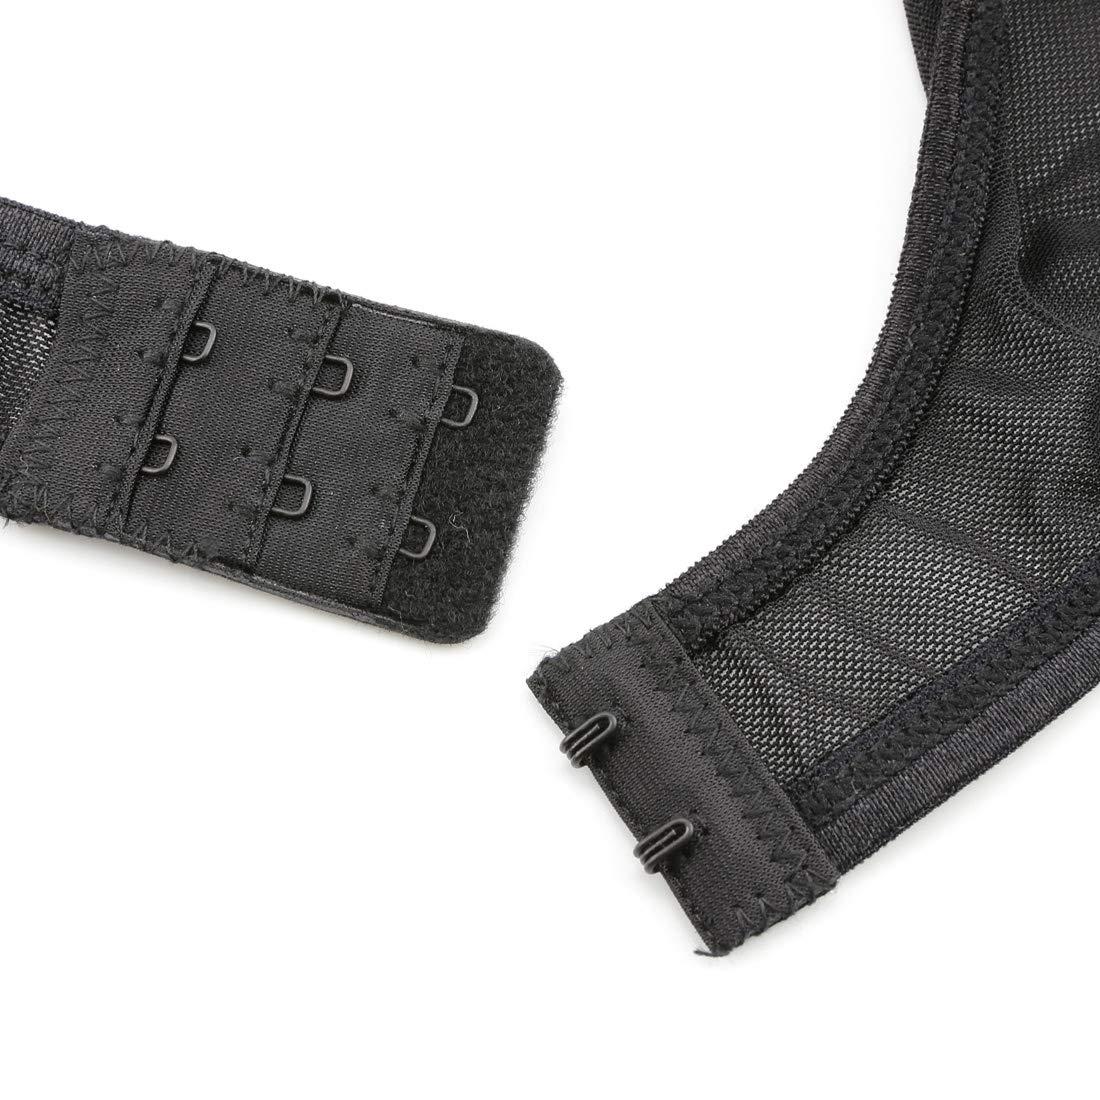 Slocyclub Women High Waist Faux Leather Black Lace Garter Belt Set